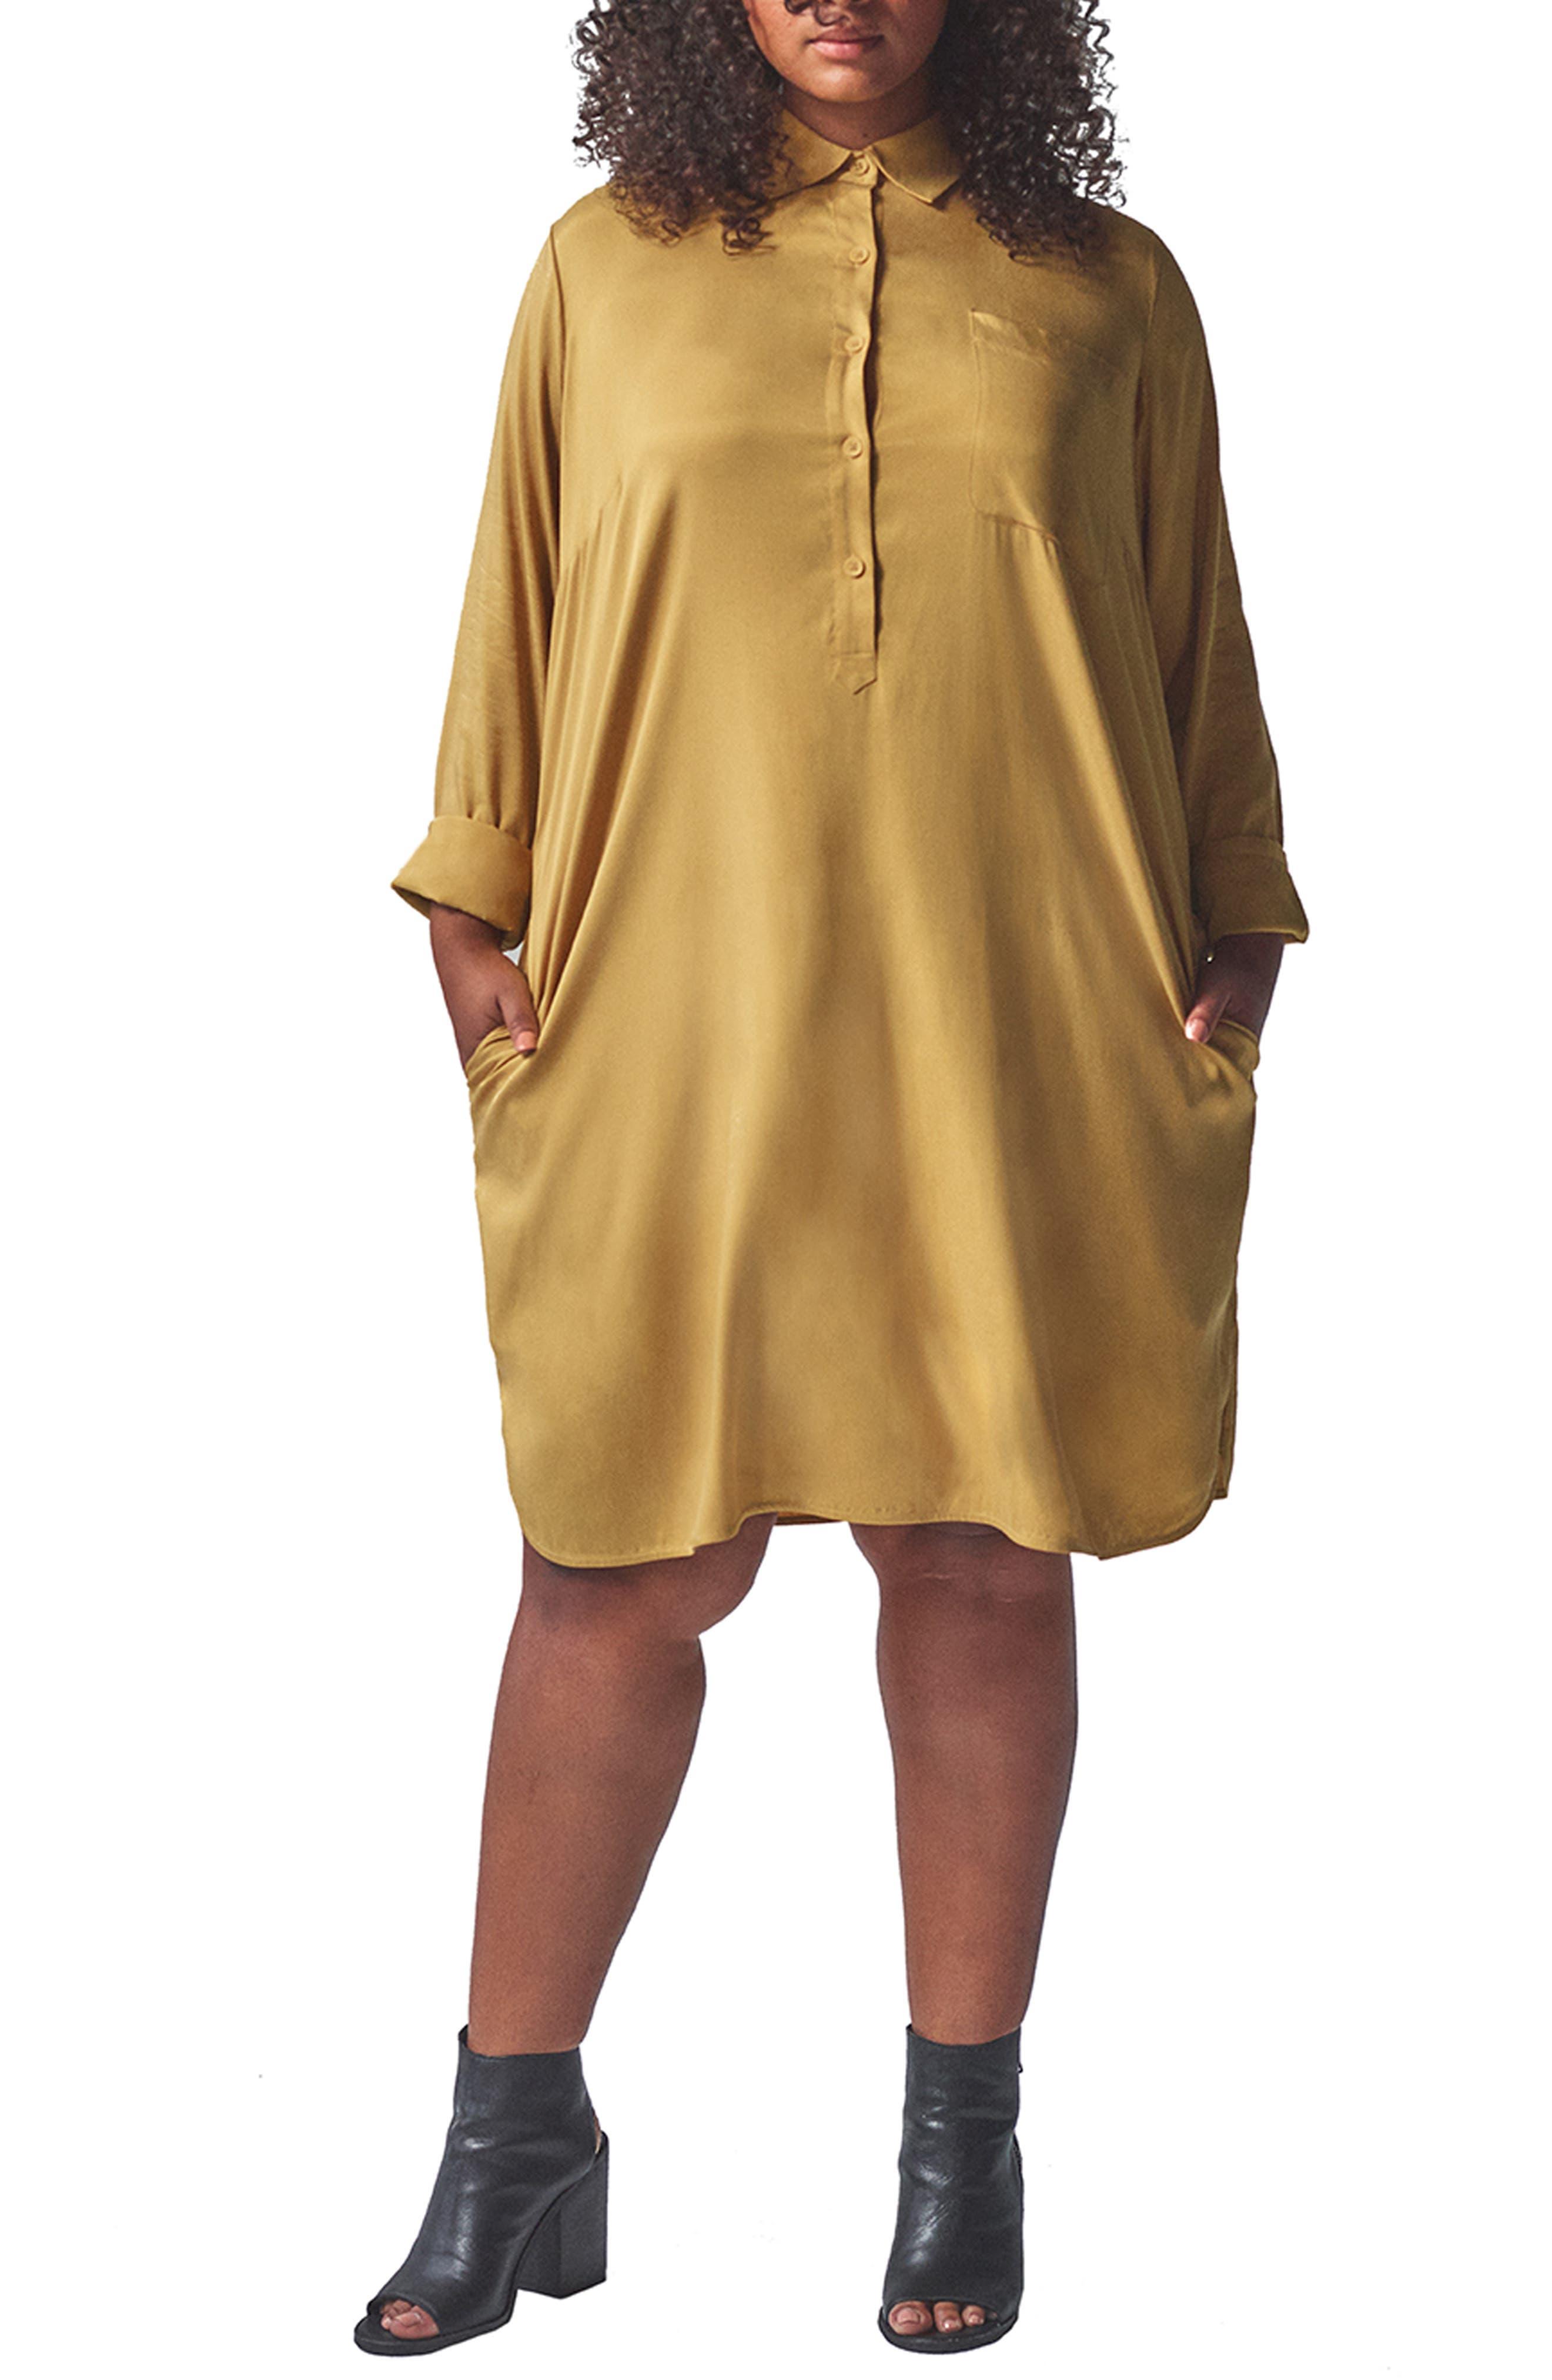 Plus Size Universal Standard Rubicon Shirtdress, Size XS (14-16) - Yellow